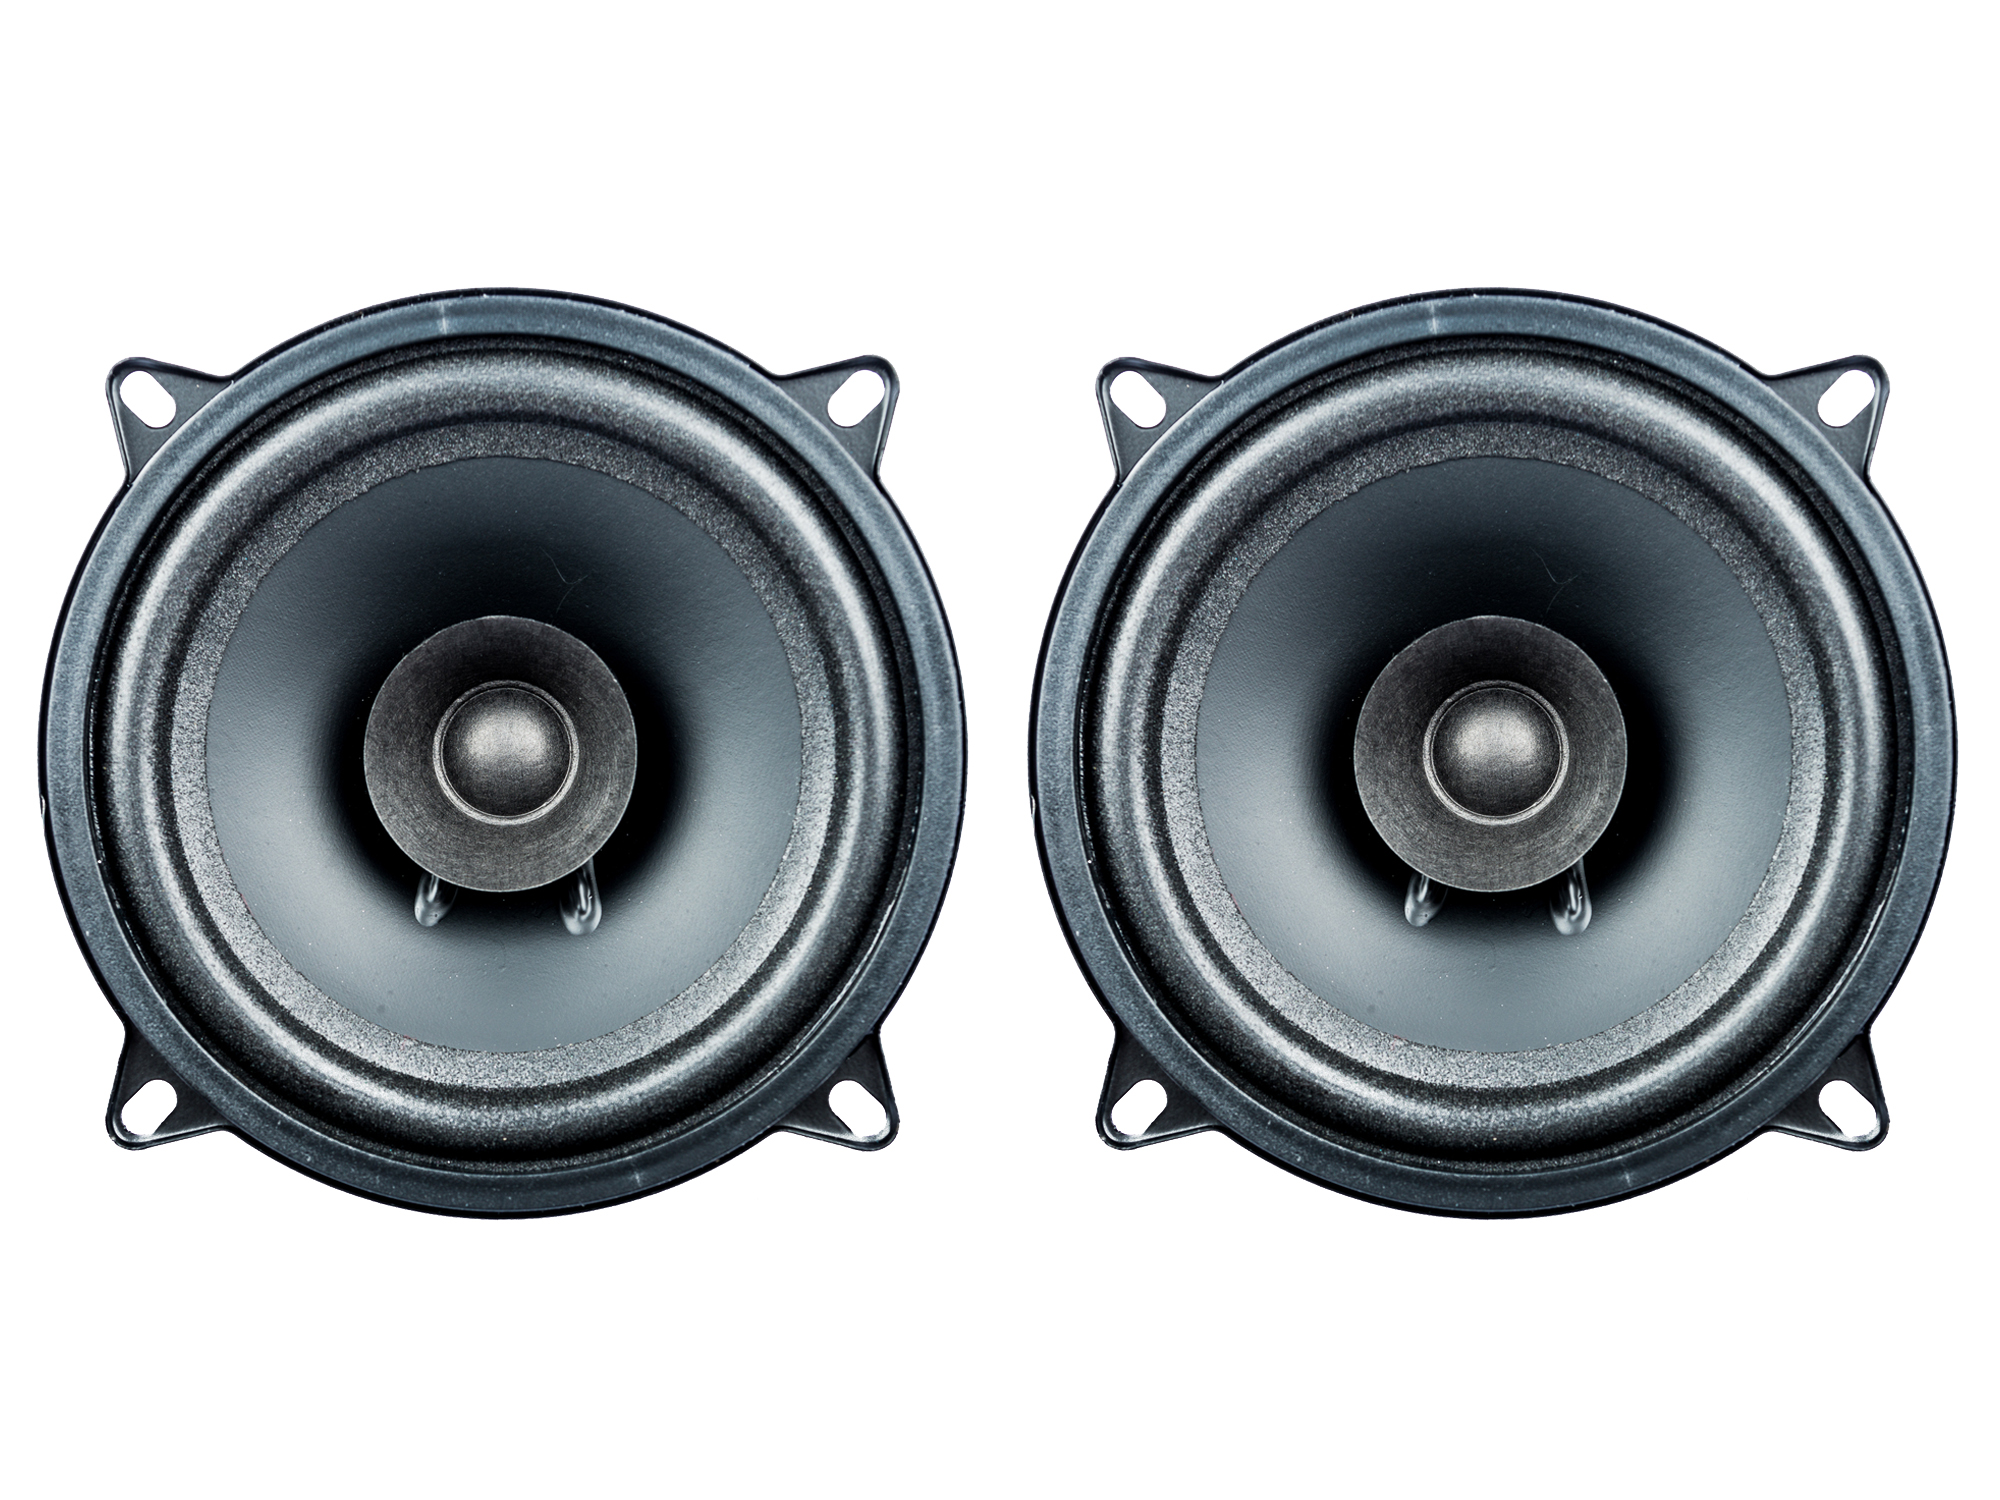 1 Paar PG Audio EVO I 13.2, 13 cm Dual Cone Lautsprecher , Neu-Ware